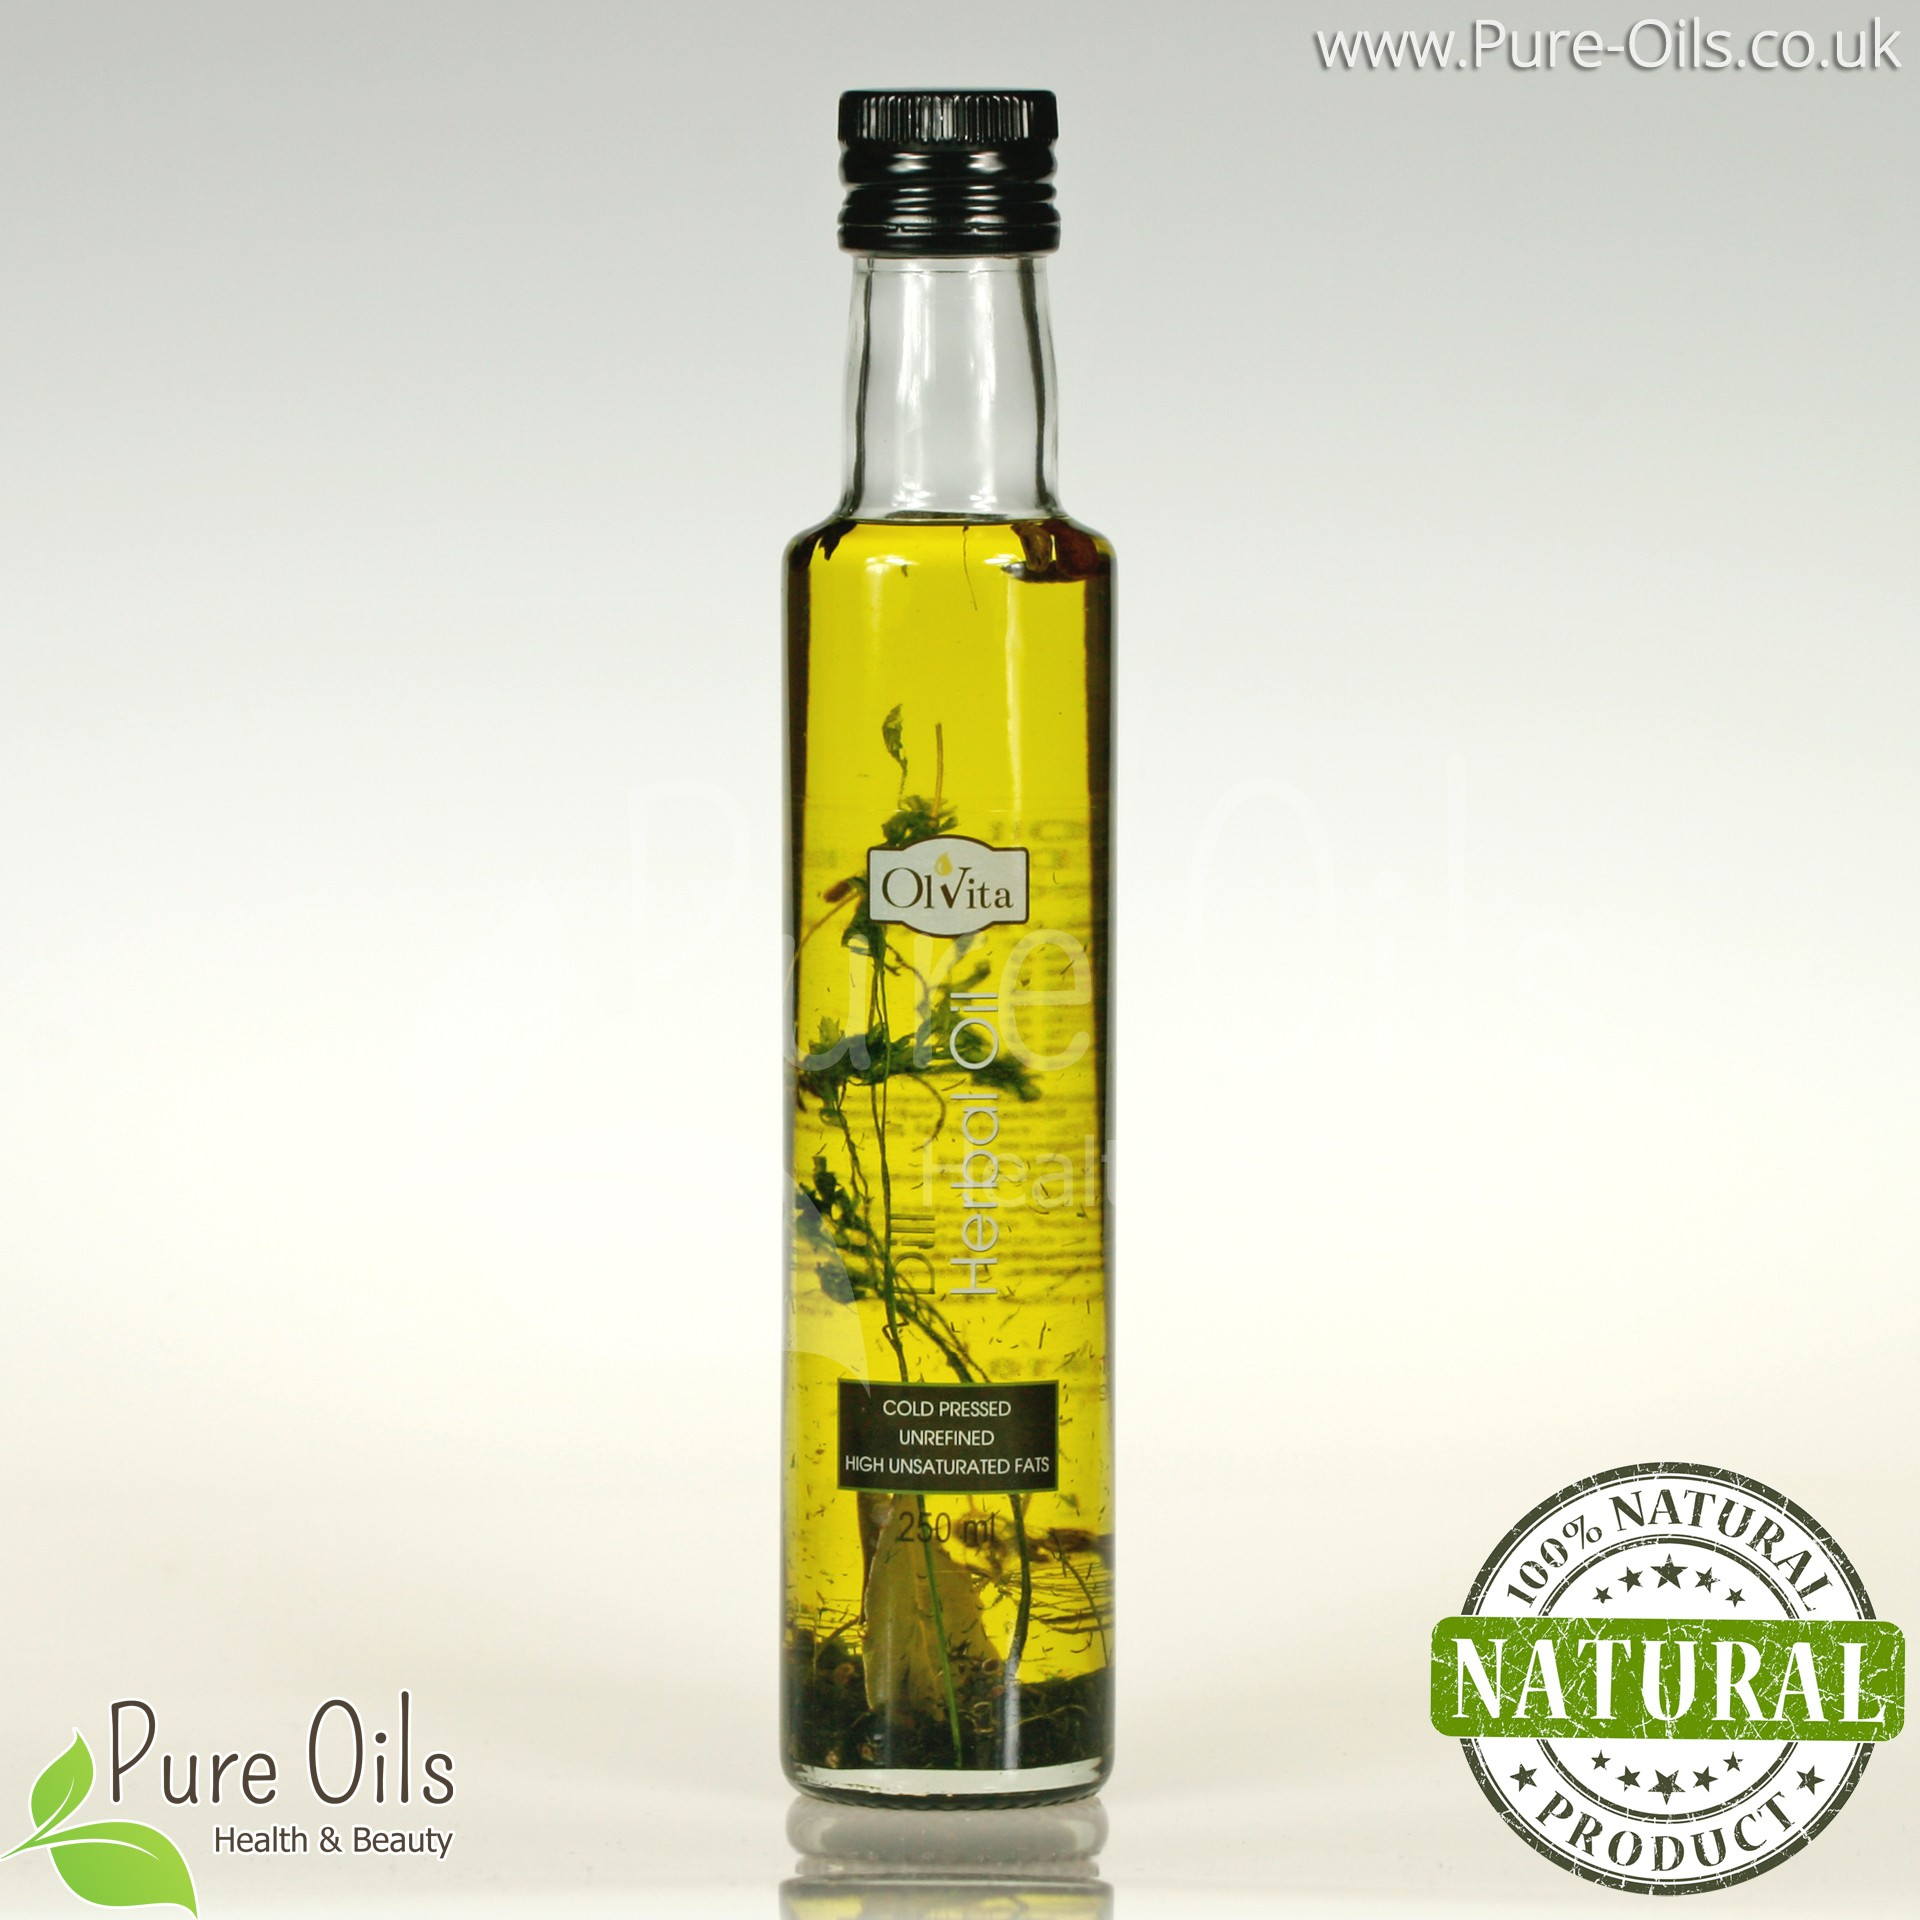 Dill Herbal oil, cold-pressed and crude Ol'Vita